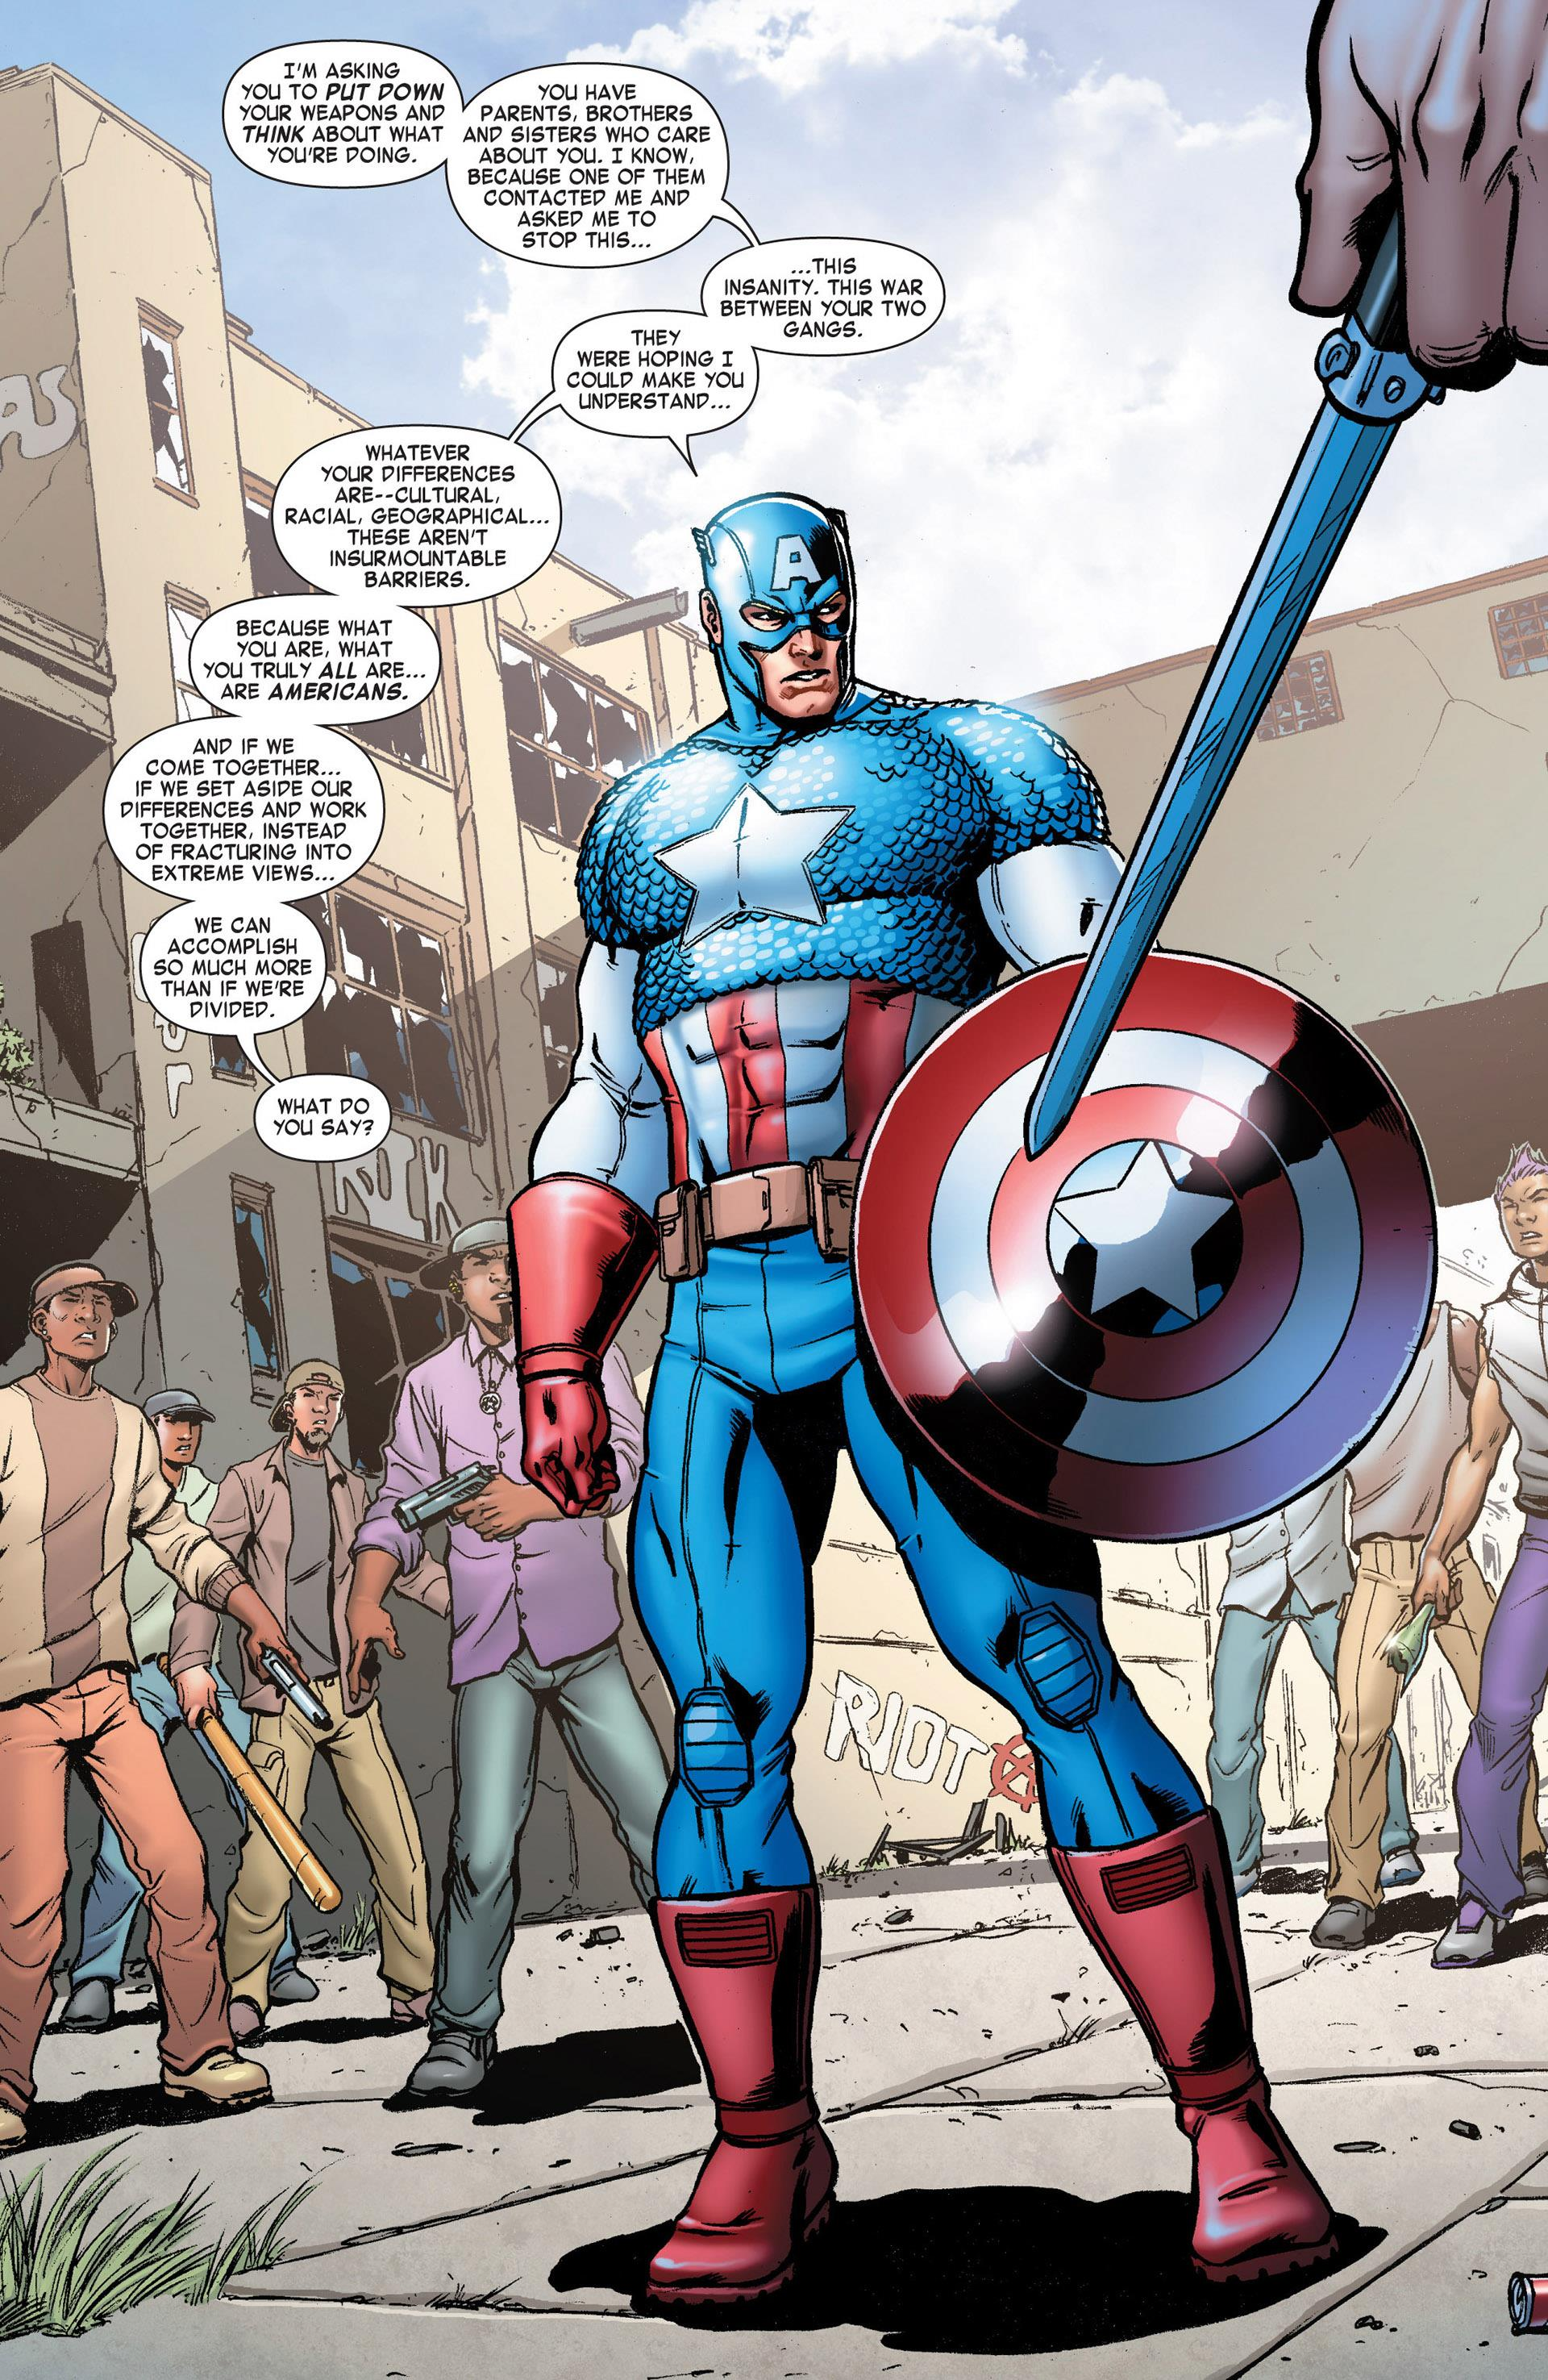 Avengers Season One review